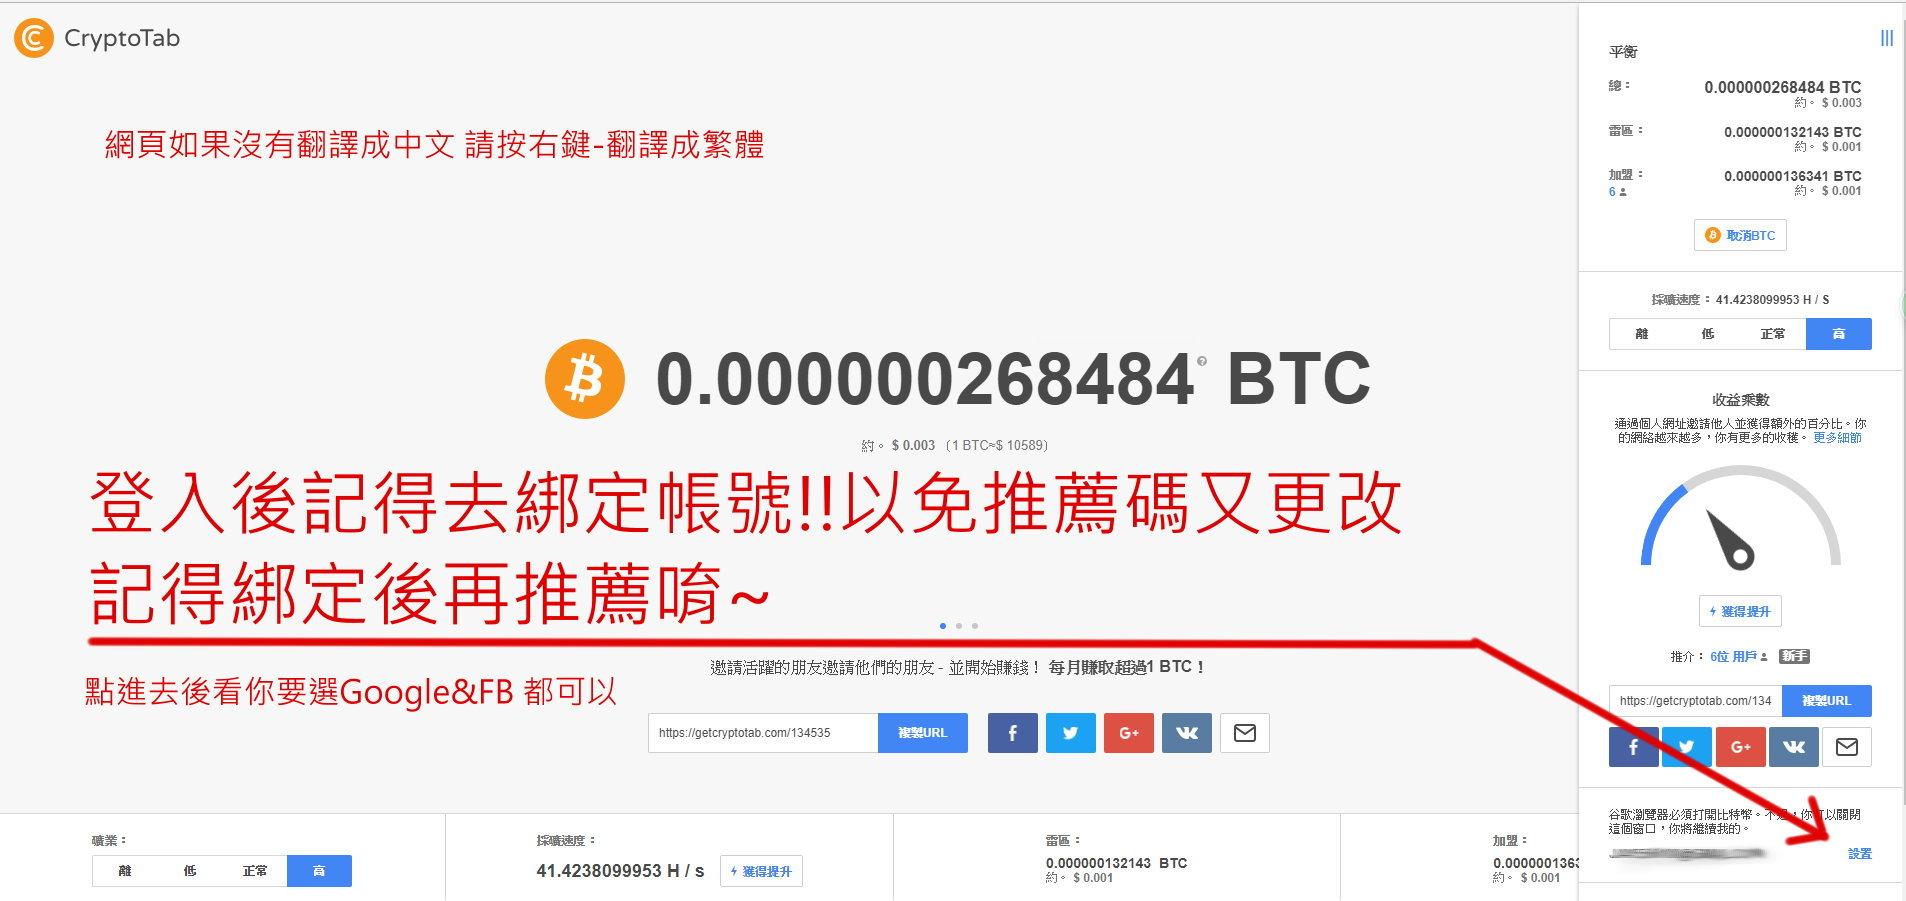 cryptotab 賺取比特幣在使用谷歌瀏覽器 - 假比特幣之名投機 - 比特臺灣論壇